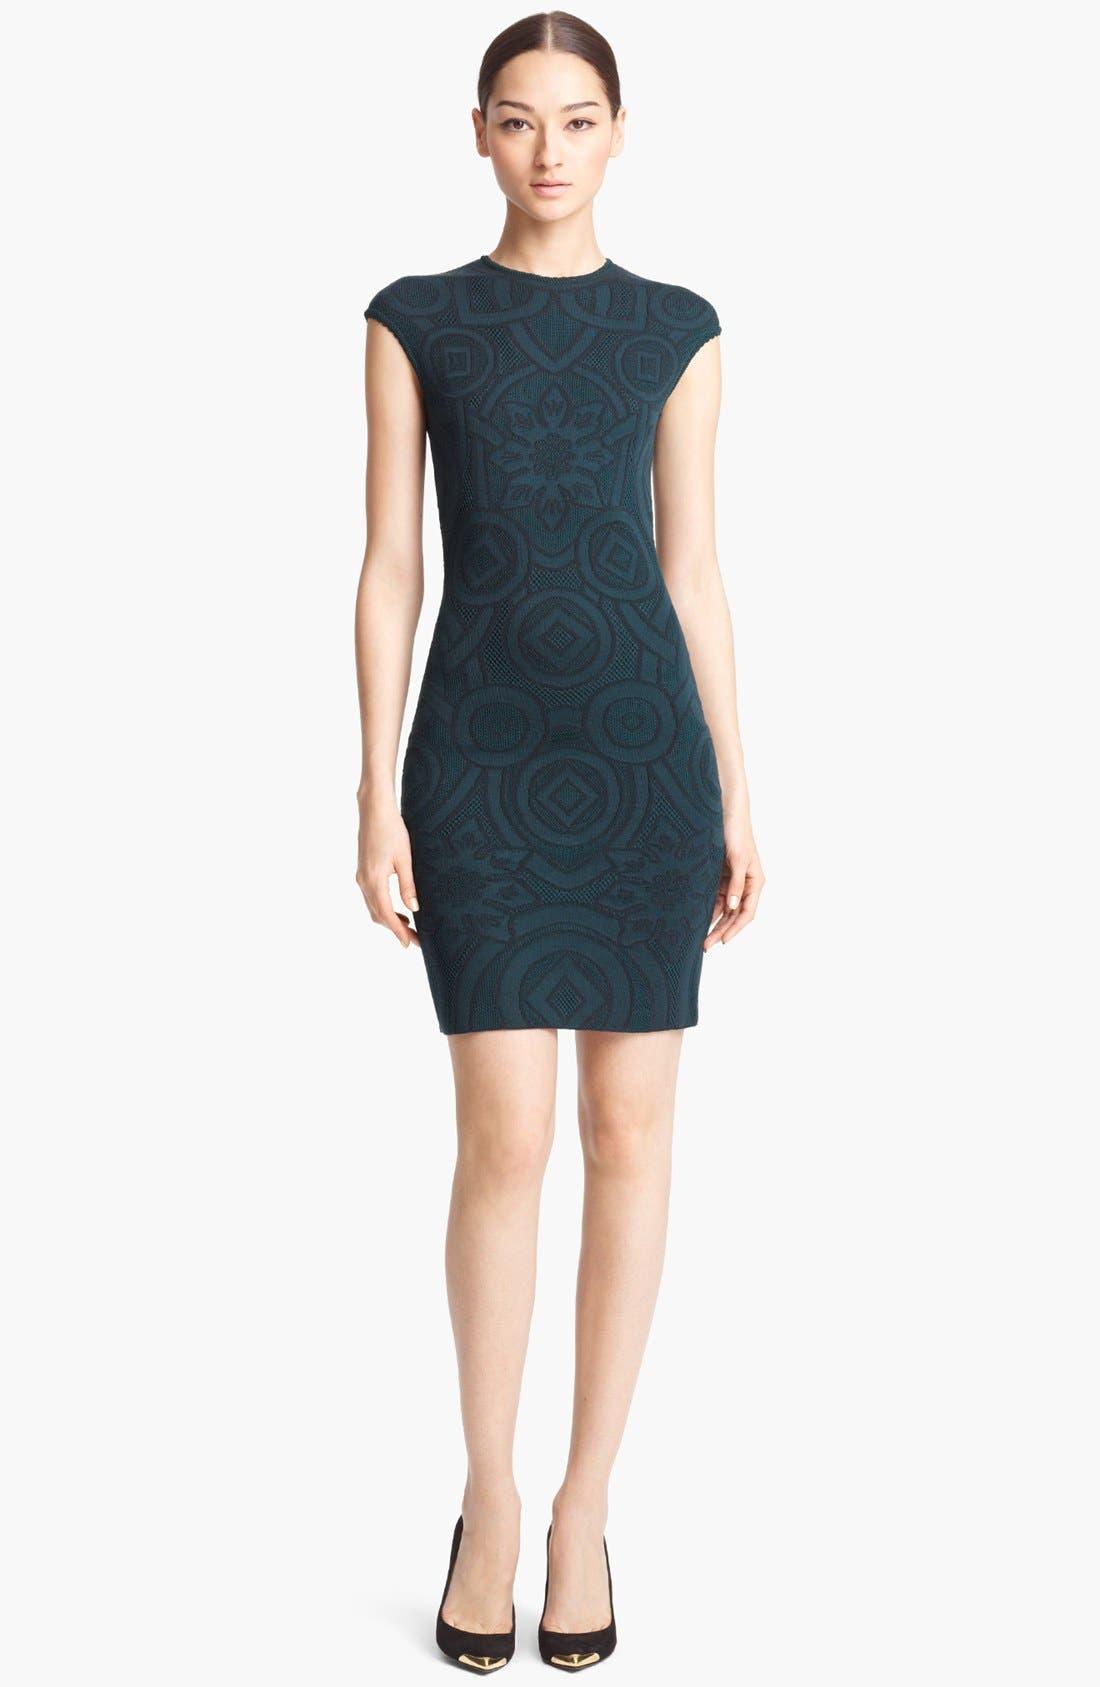 Alternate Image 1 Selected - Alexander McQueen Jacquard Dress